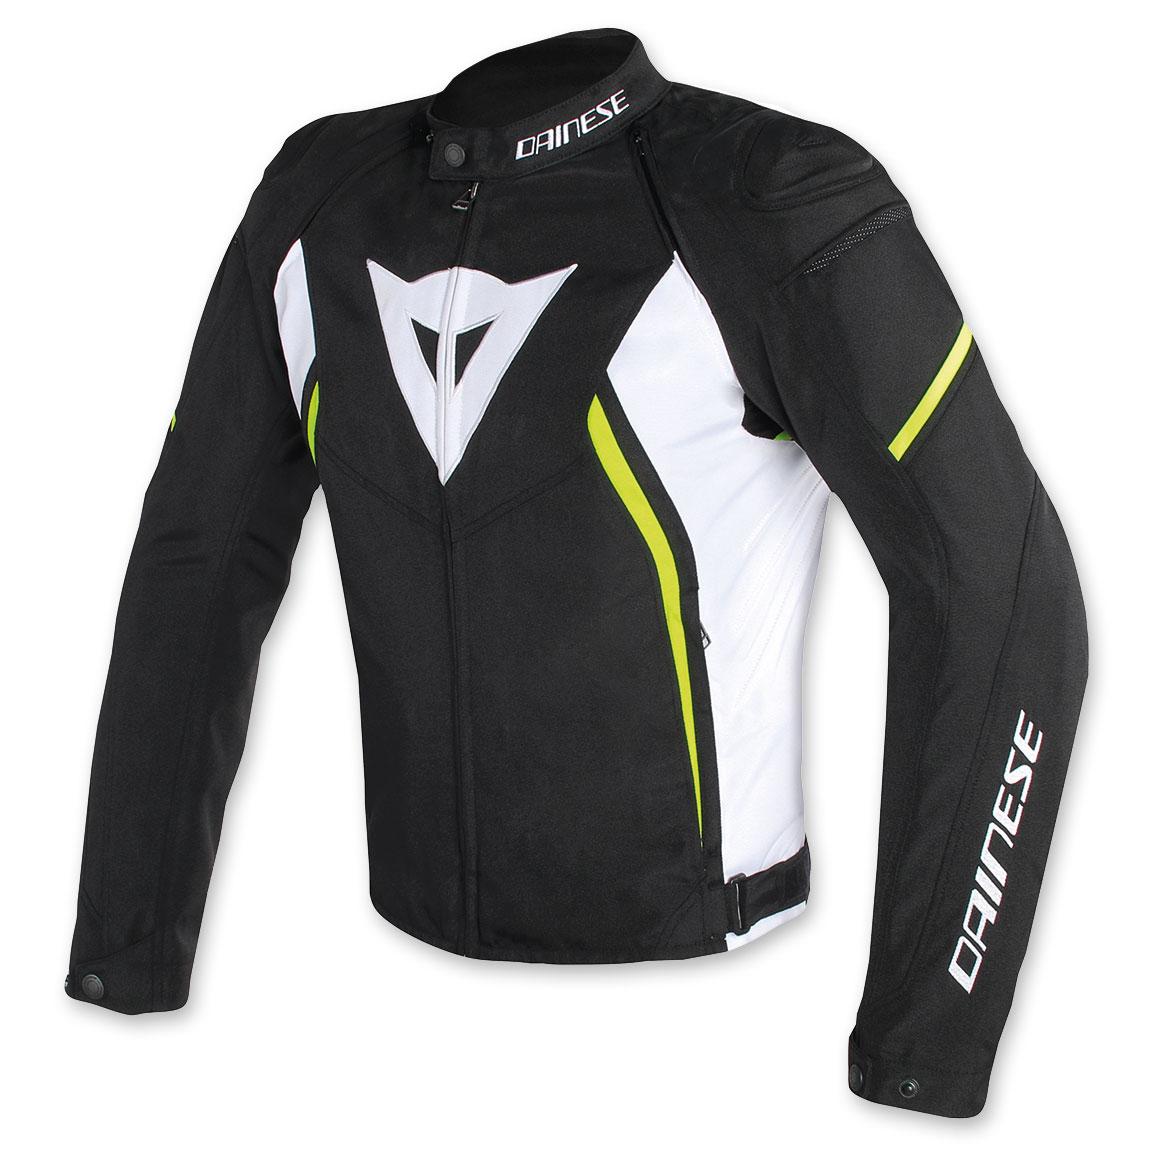 Dainese Men's Avro D2 Black/White/Yellow Jacket